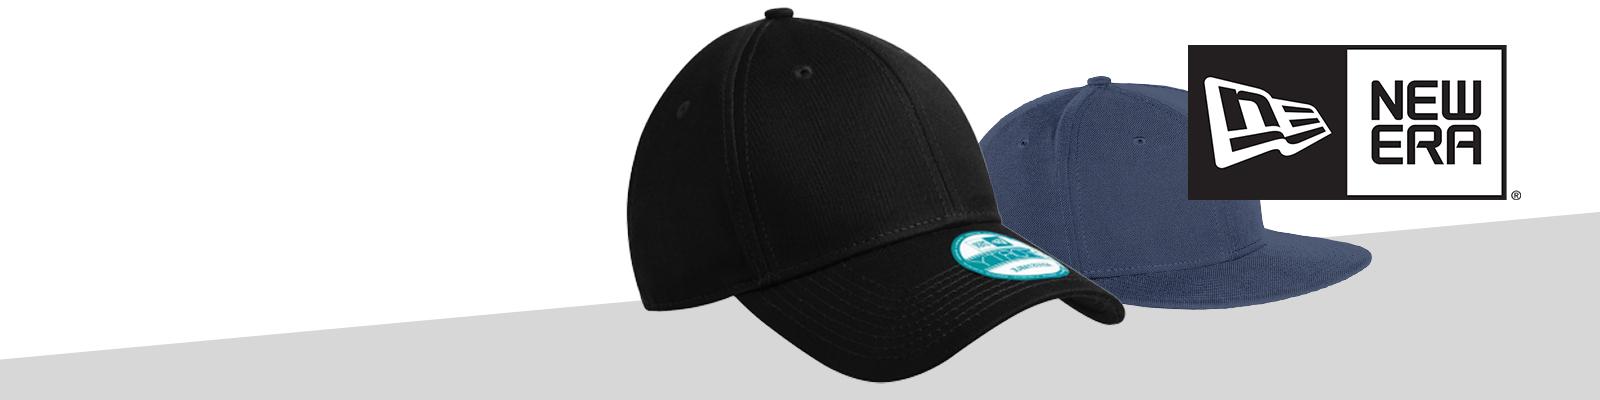 Custom New Era Hats